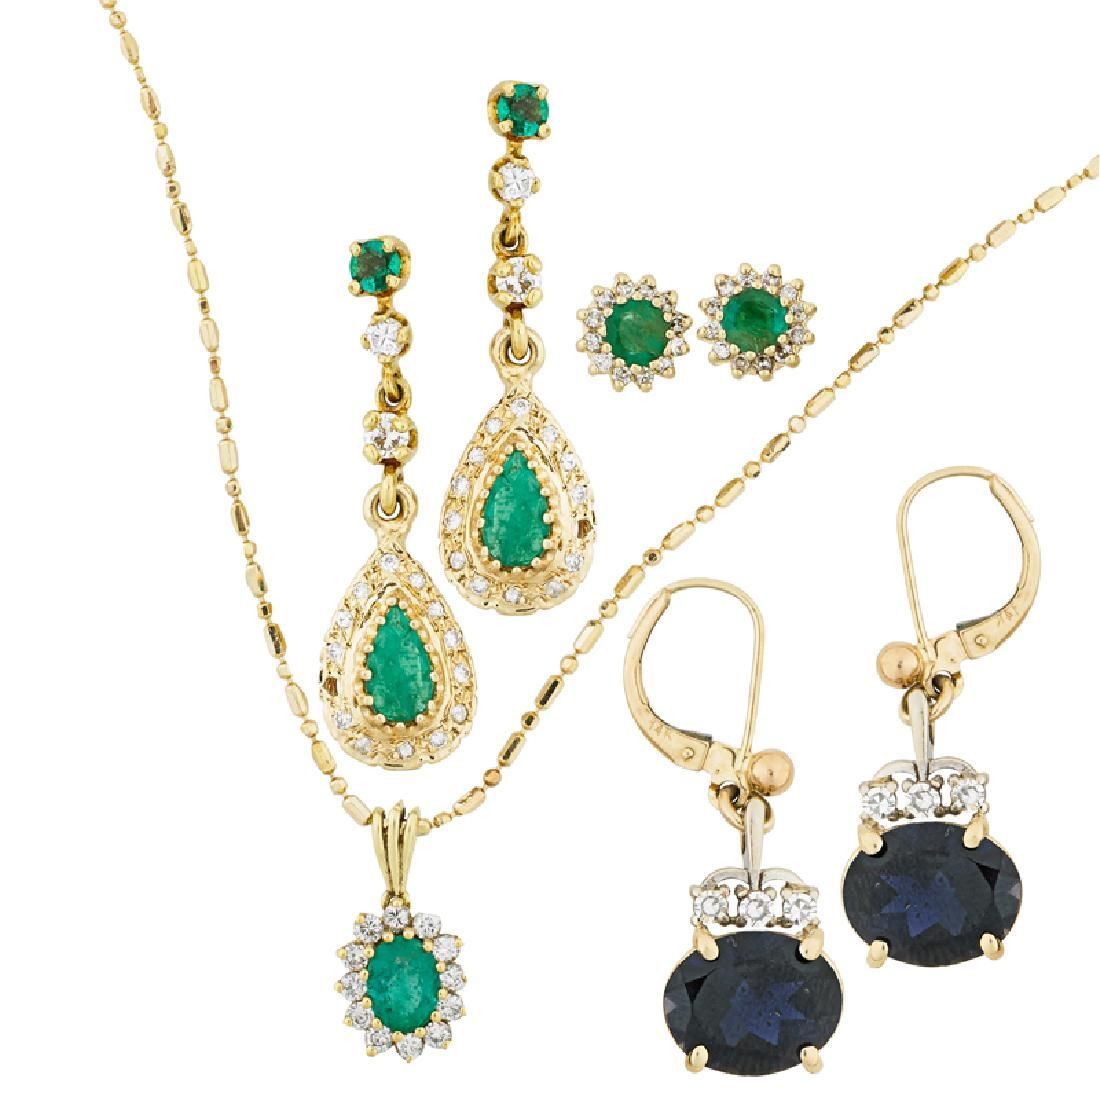 DIAMOND, EMERALD OR AMETHYST YELLOW GOLD JEWELRY